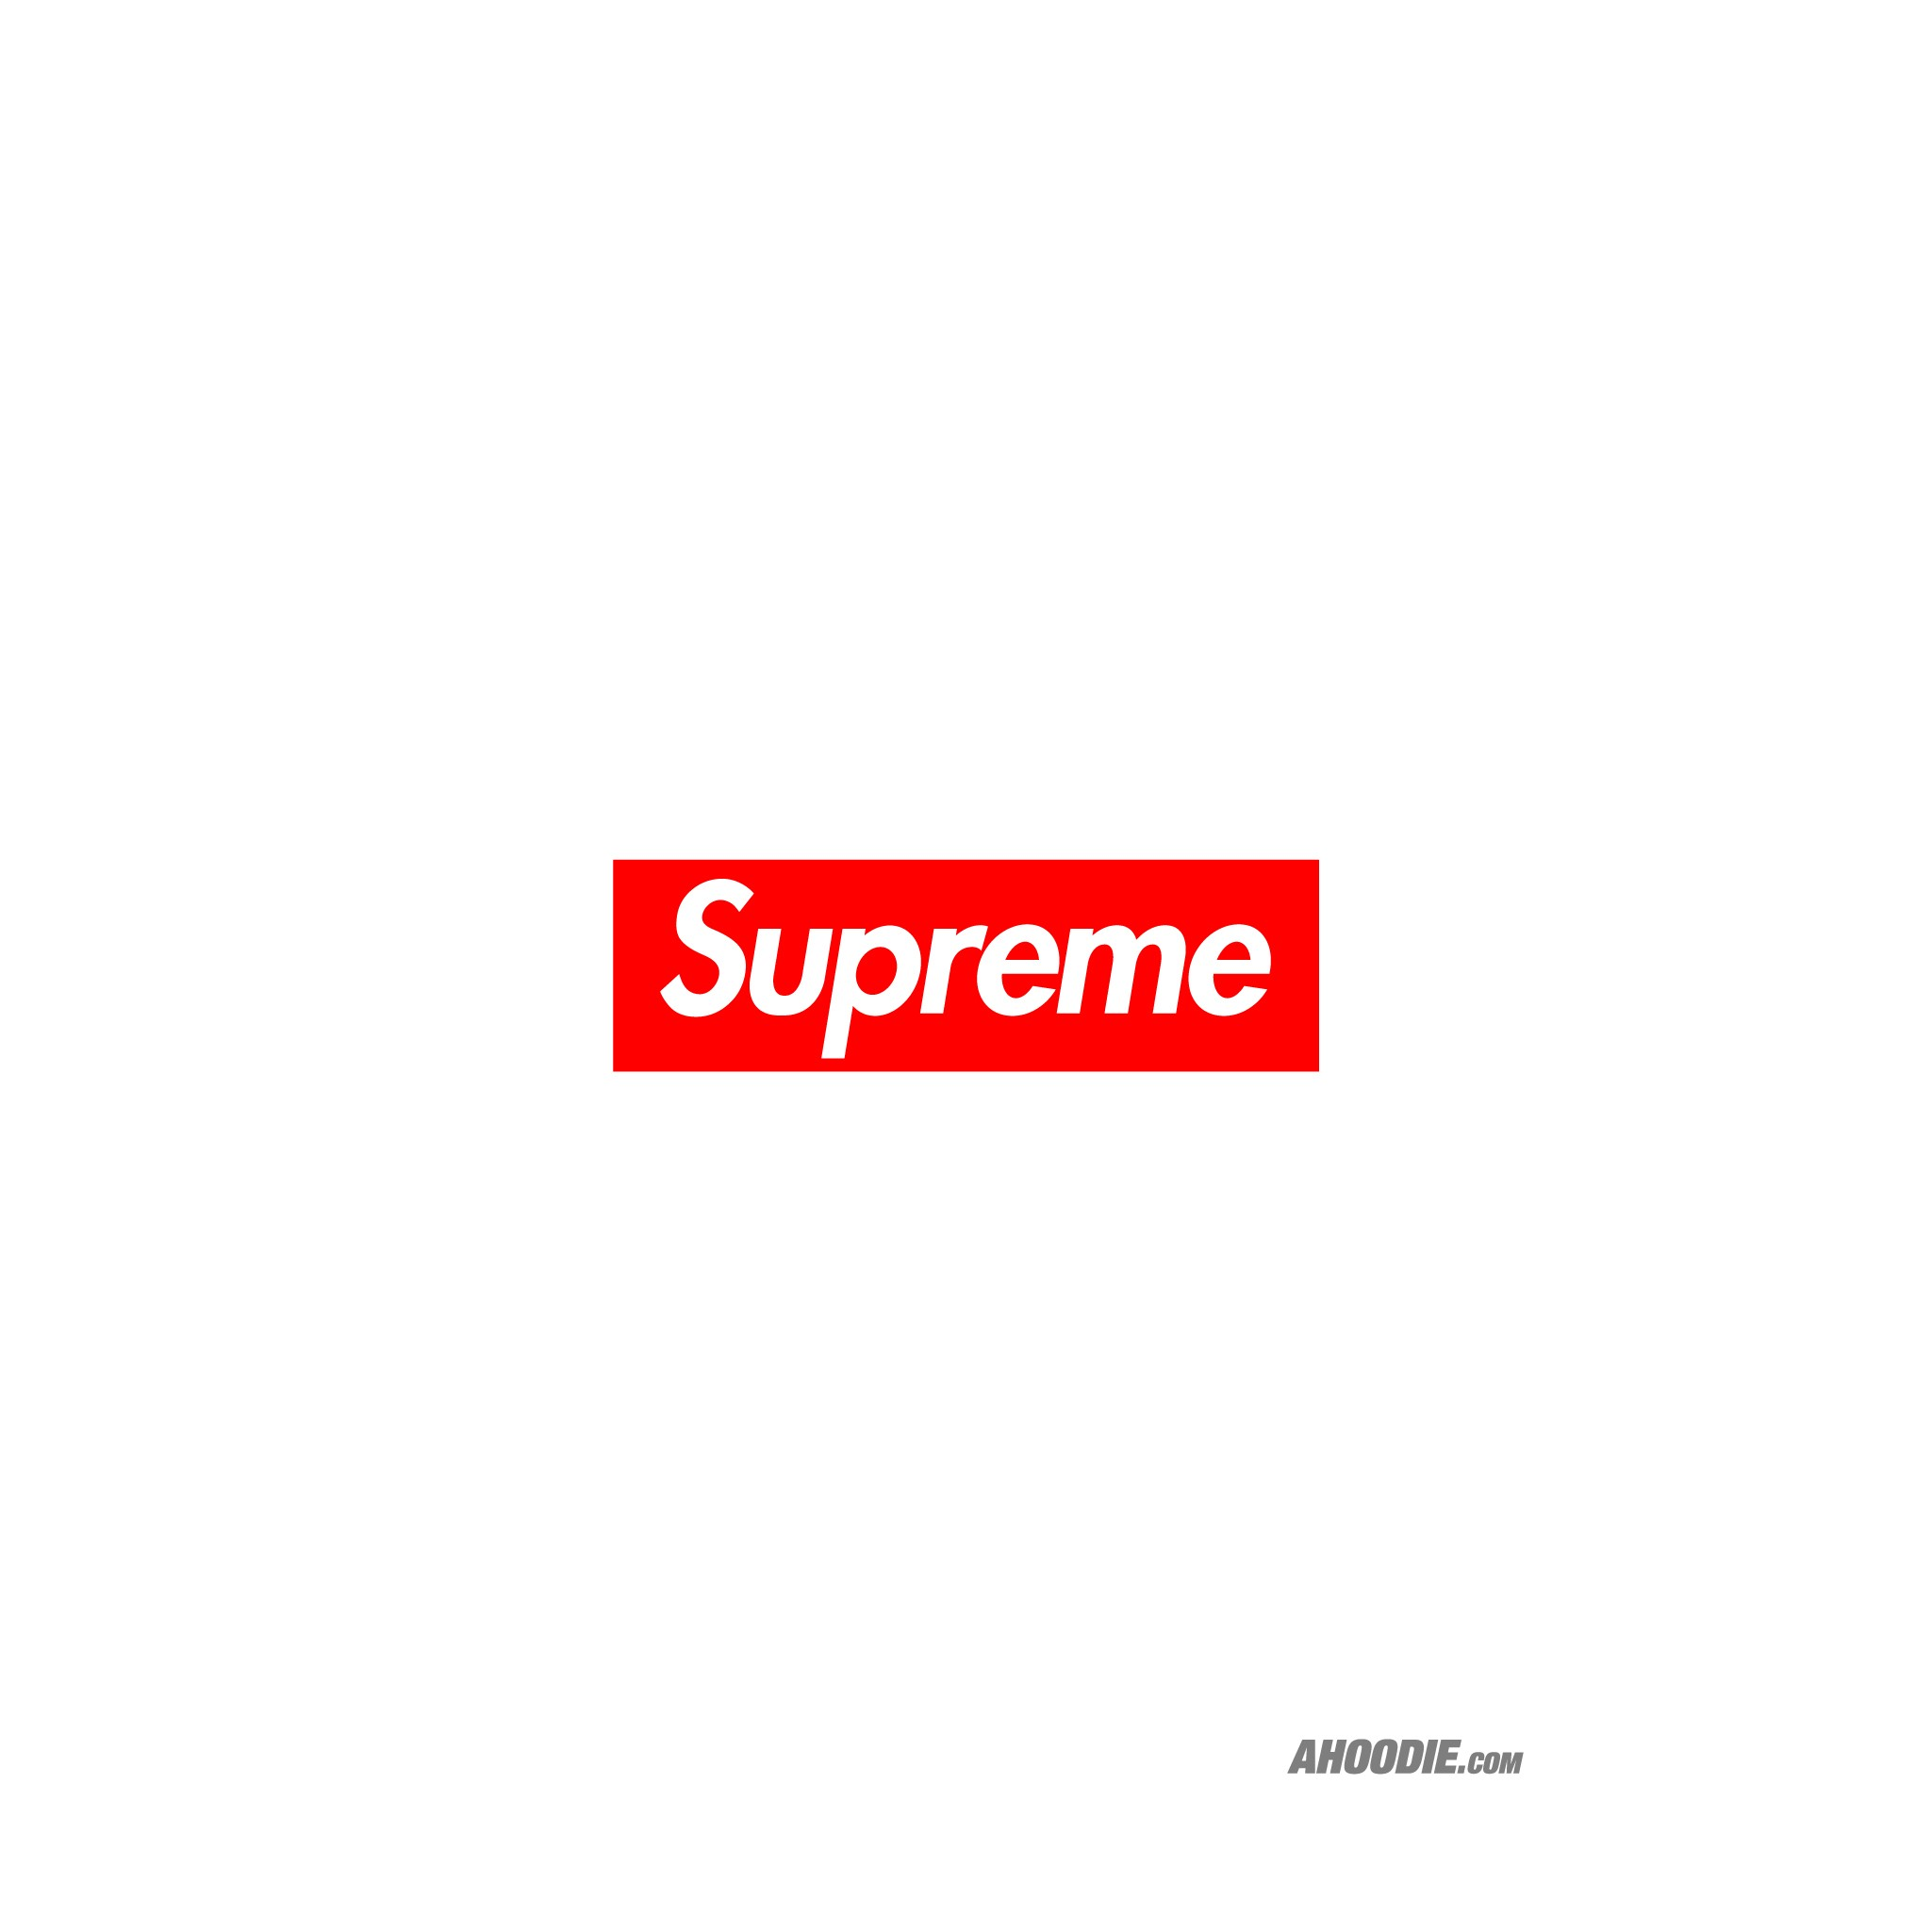 Ahoodie Supreme classic box logo wallpaper 2049x2049